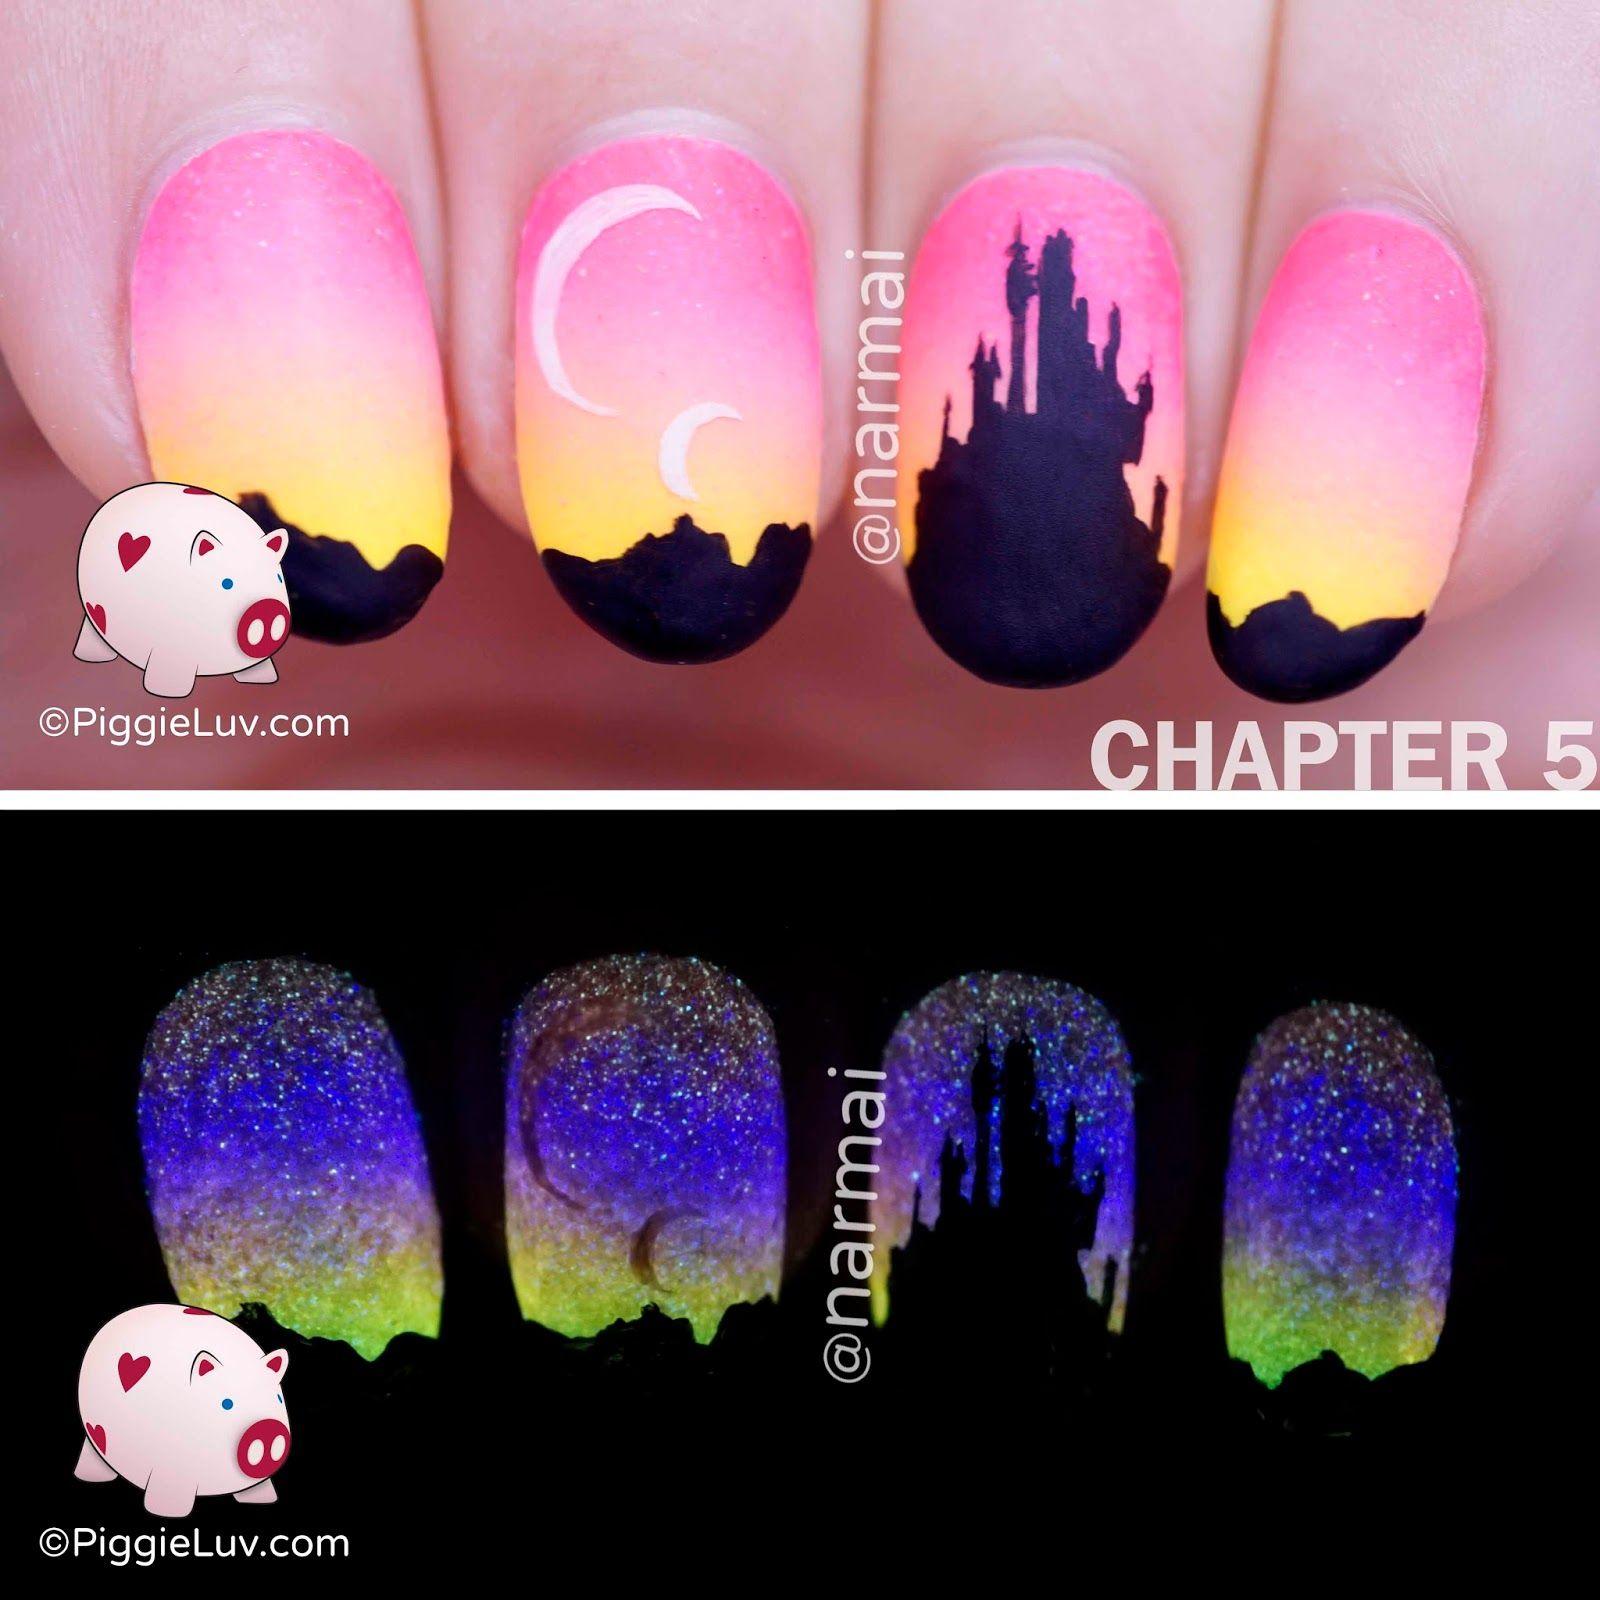 Piggieluv Galaxy Donuts Nail Art: Freehand Epic Portal Story Nail Art (5 Glow In The Dark